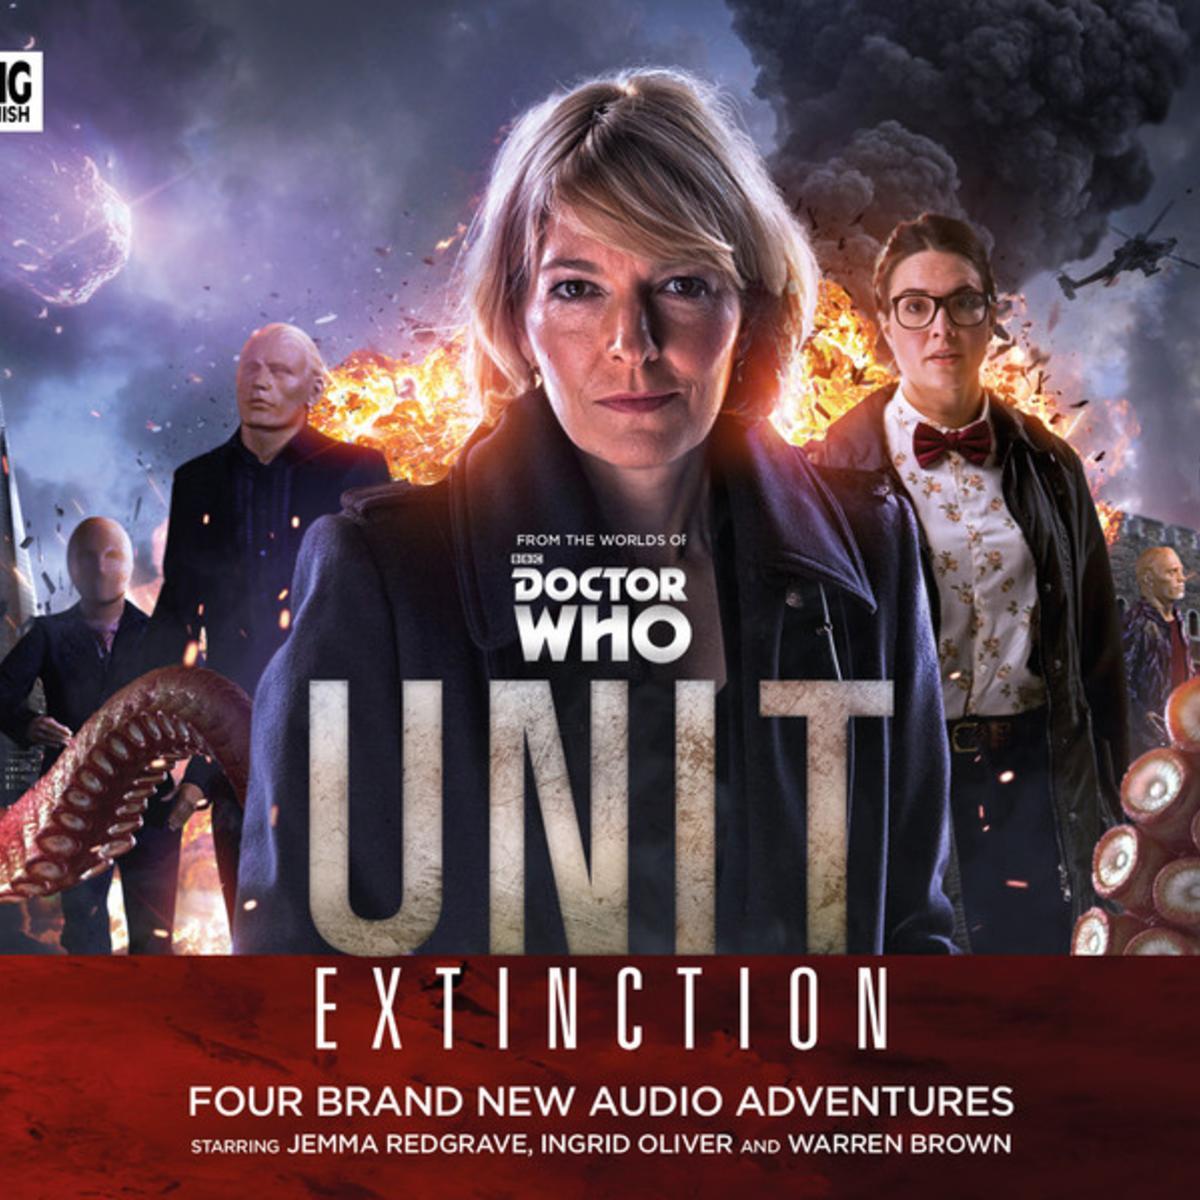 Unit-Extinction-Big-Finish.png